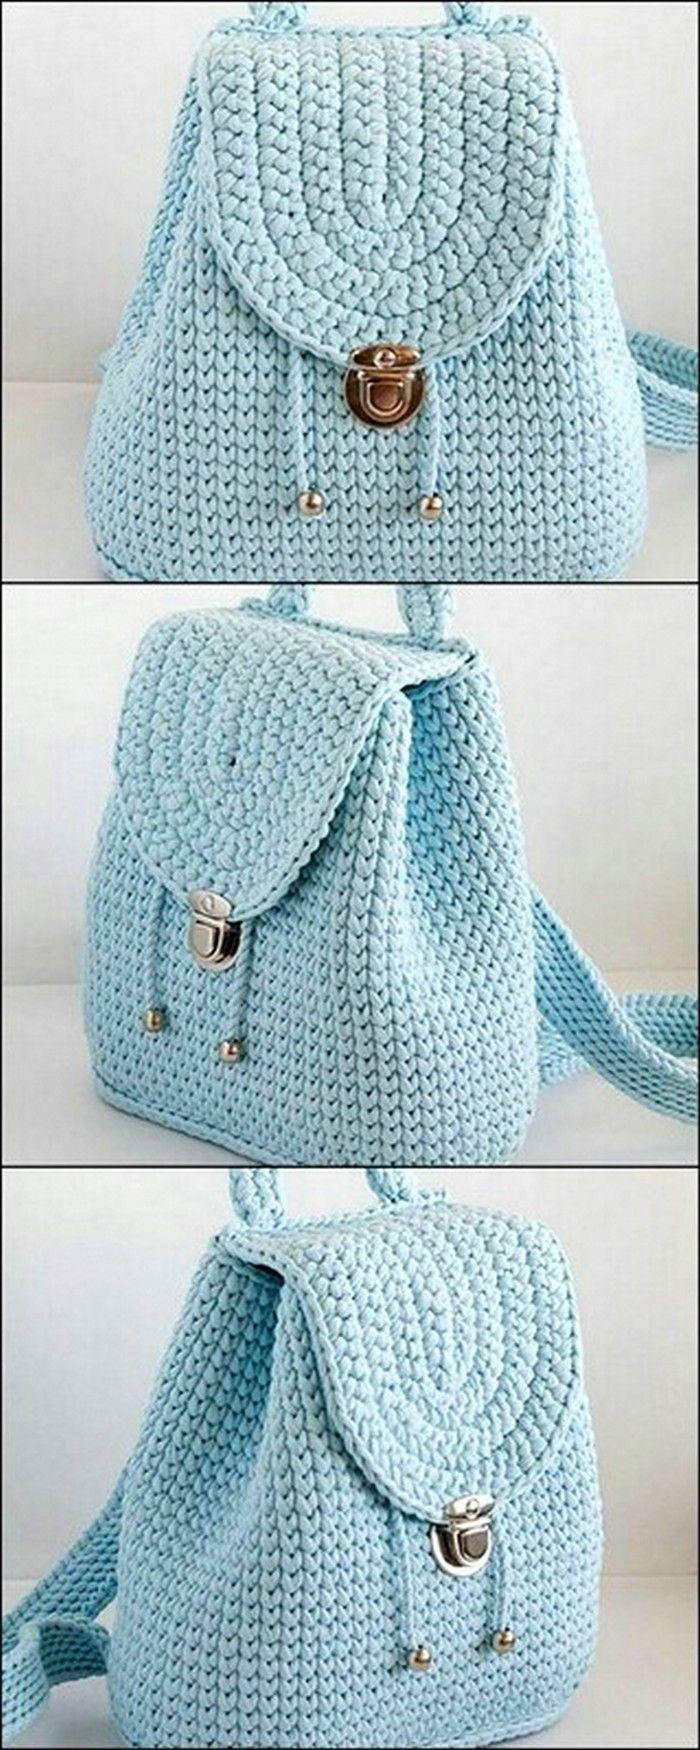 diy Amazing crochet handbag #amigurumi #crochet #knitting #amigurumipatterns #c … – amigurumi bebek